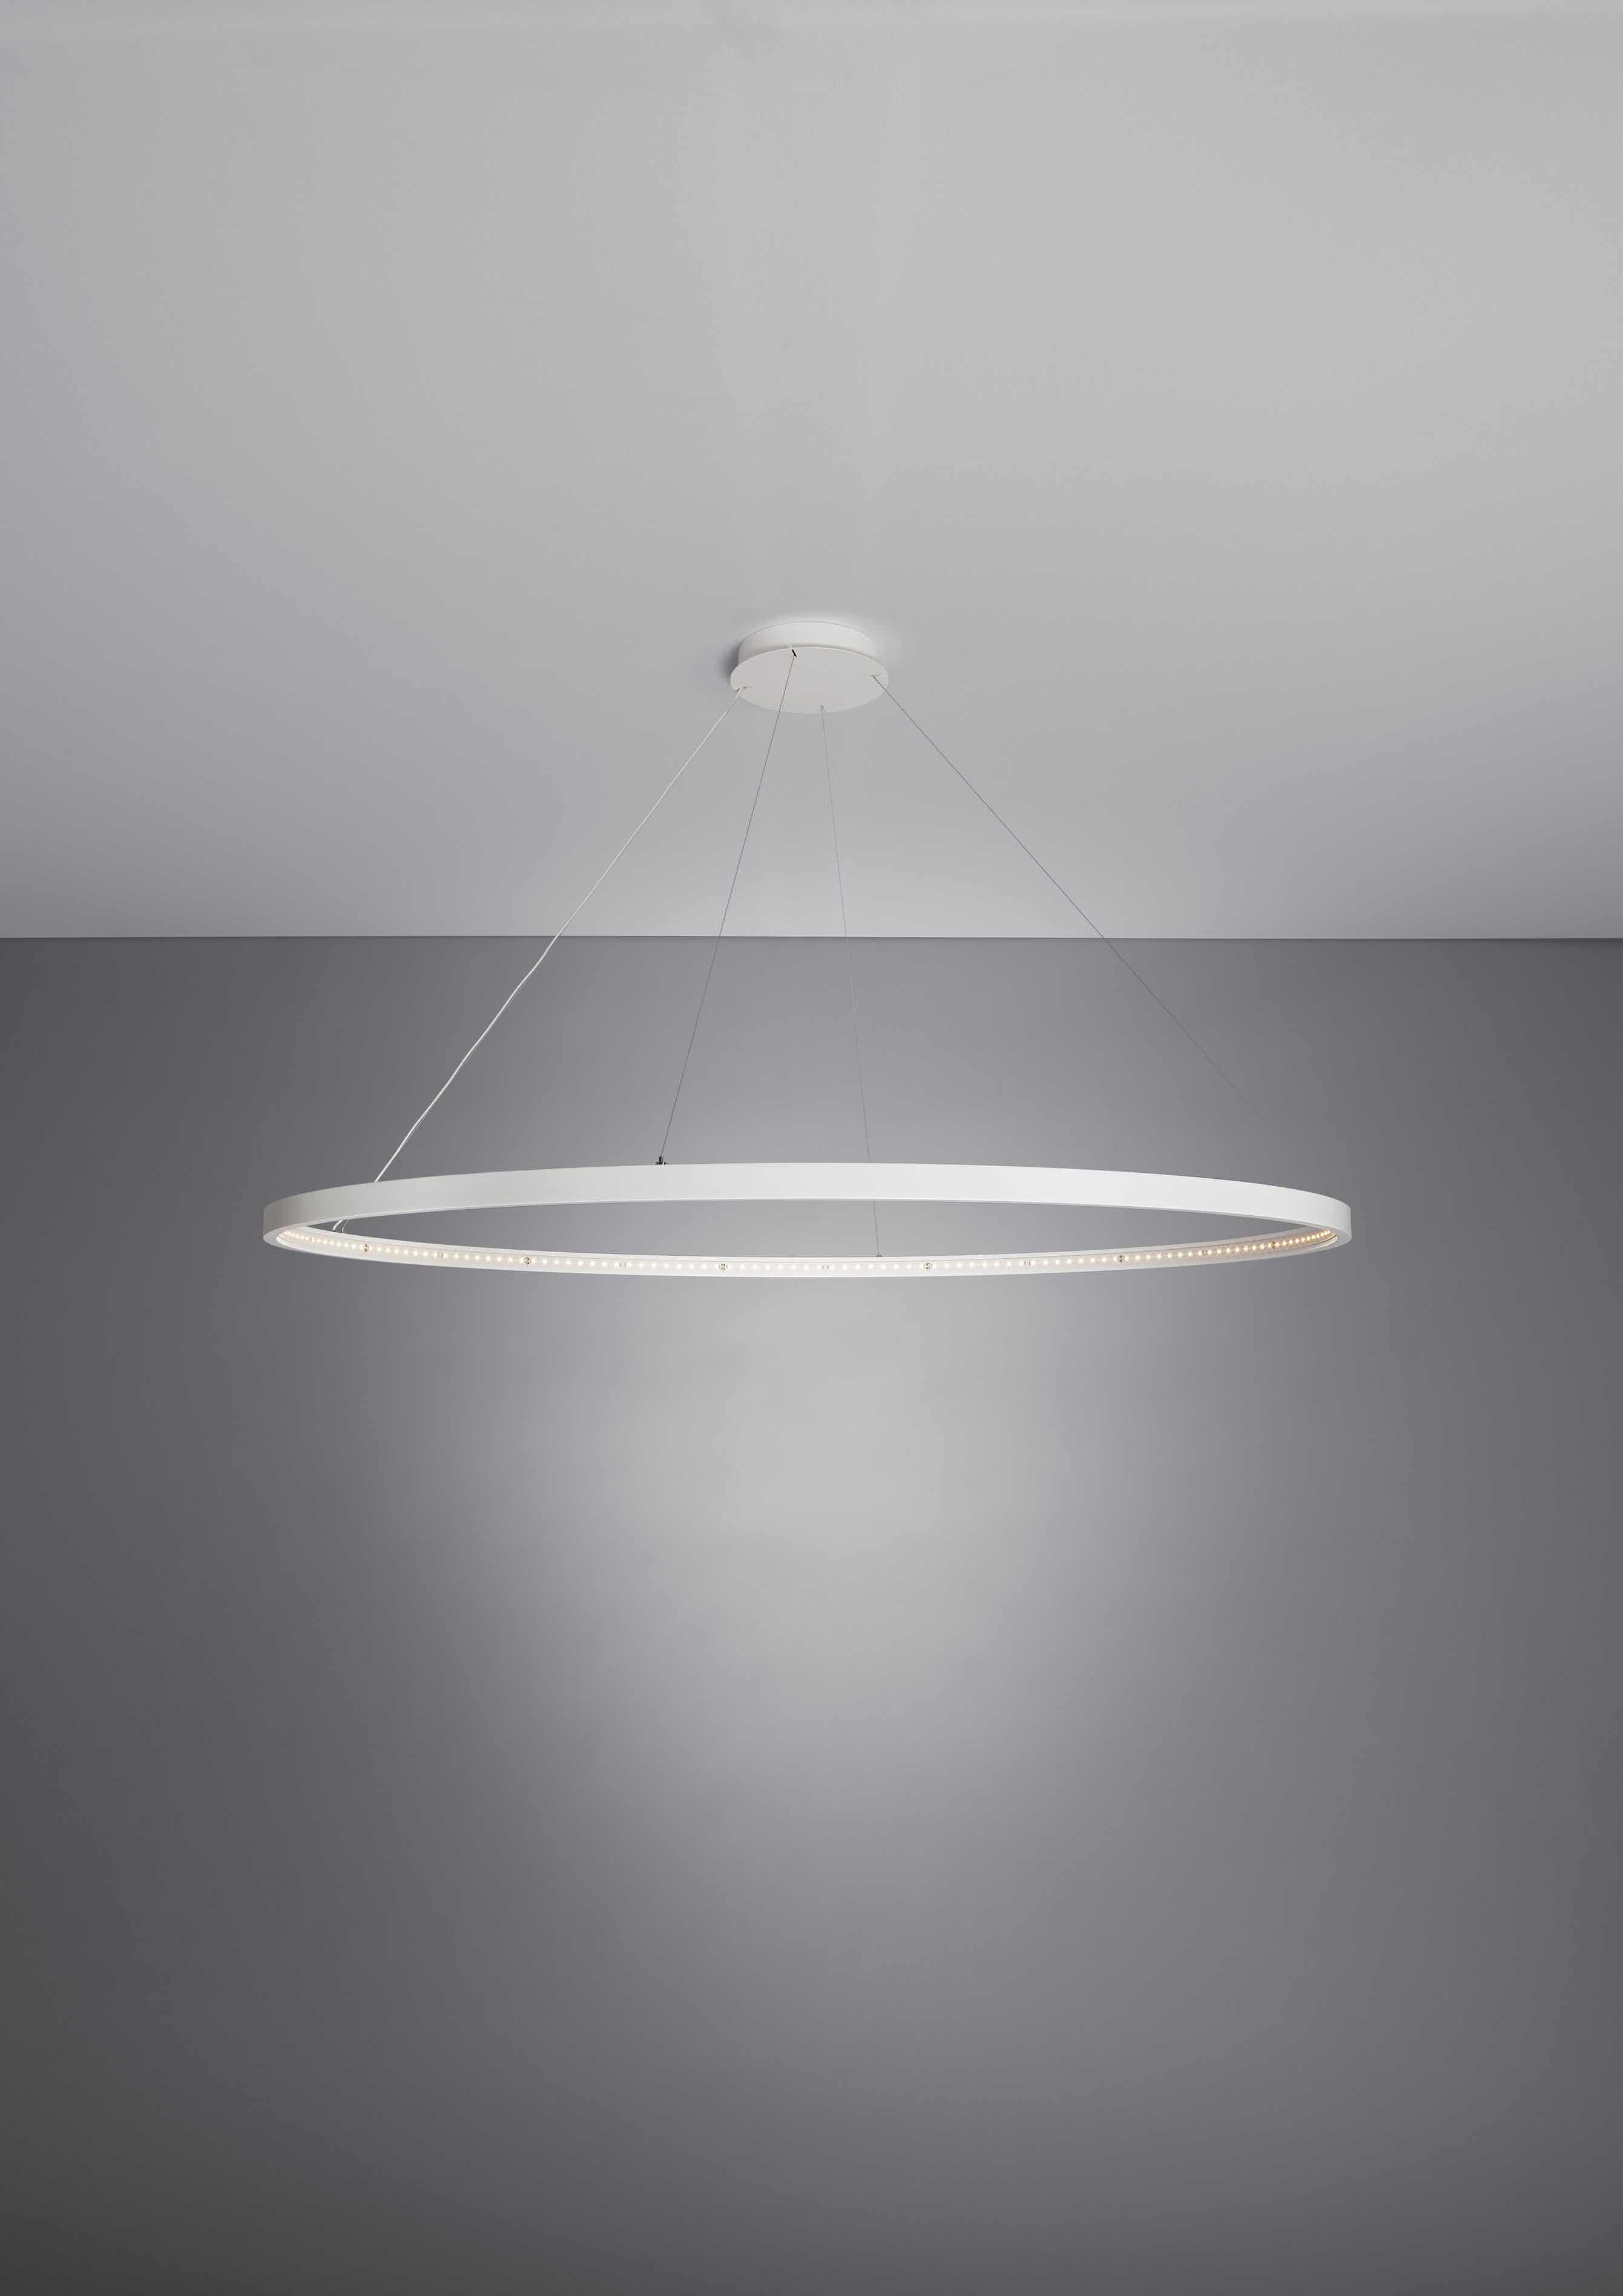 Le-deun-luminaires-omega-hanging-lamp-white-ceiling-haute-living